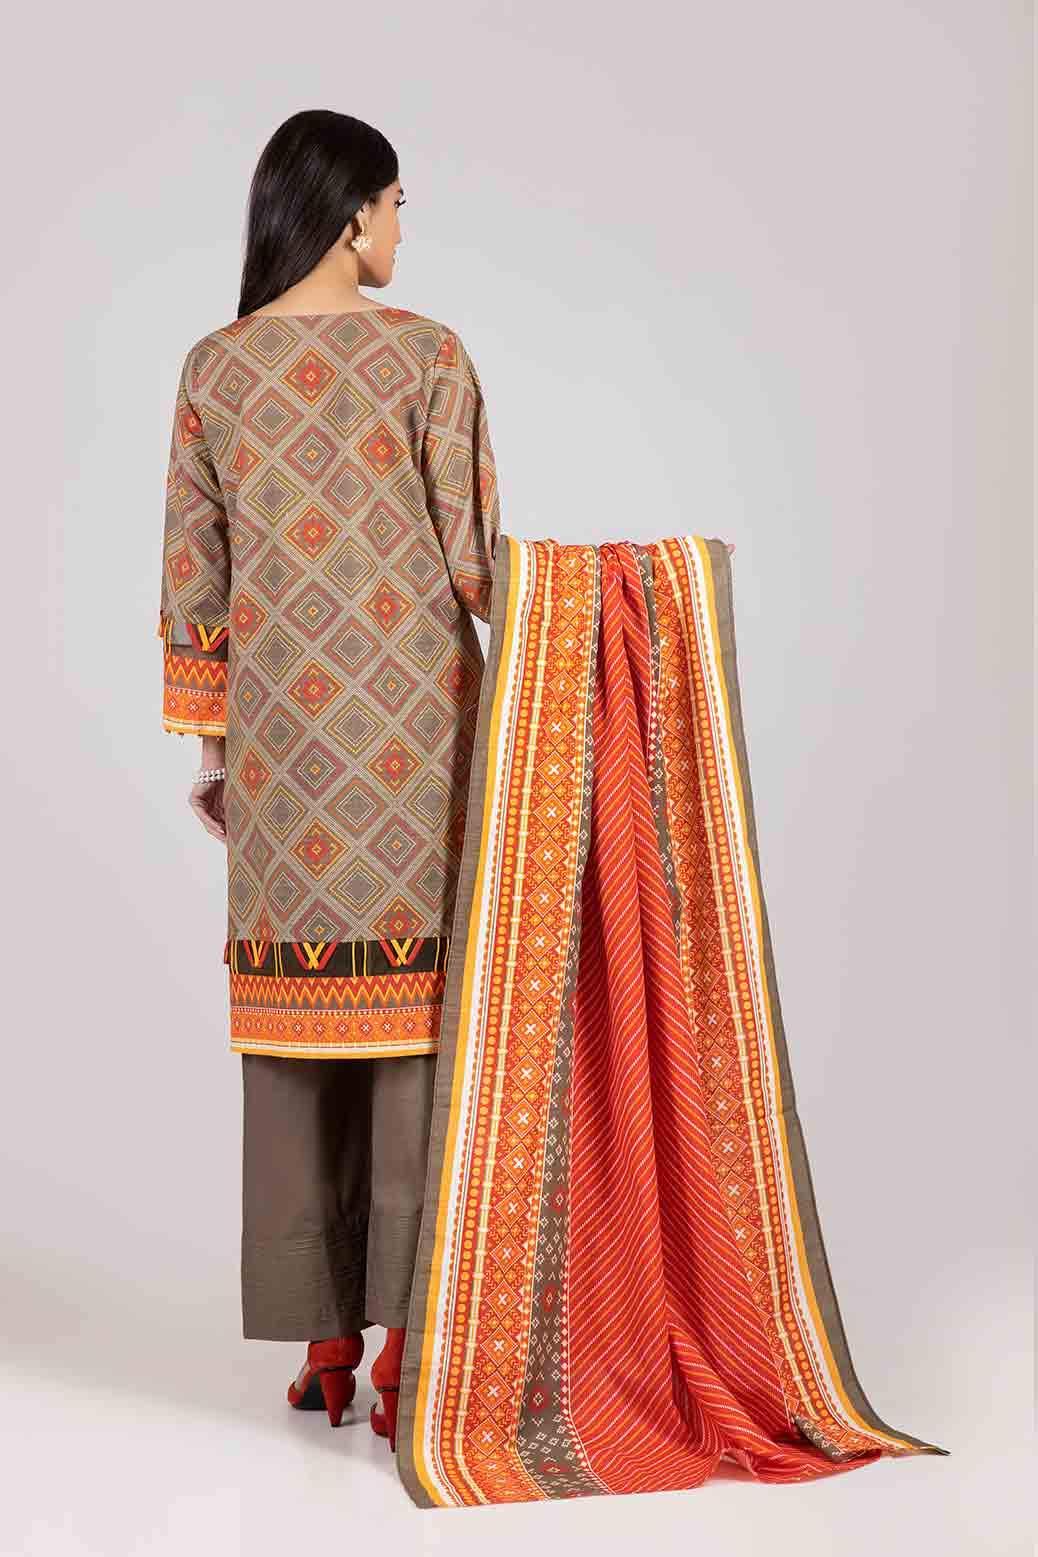 Bonanza Satrangi Ready to wear brown color suit back side view